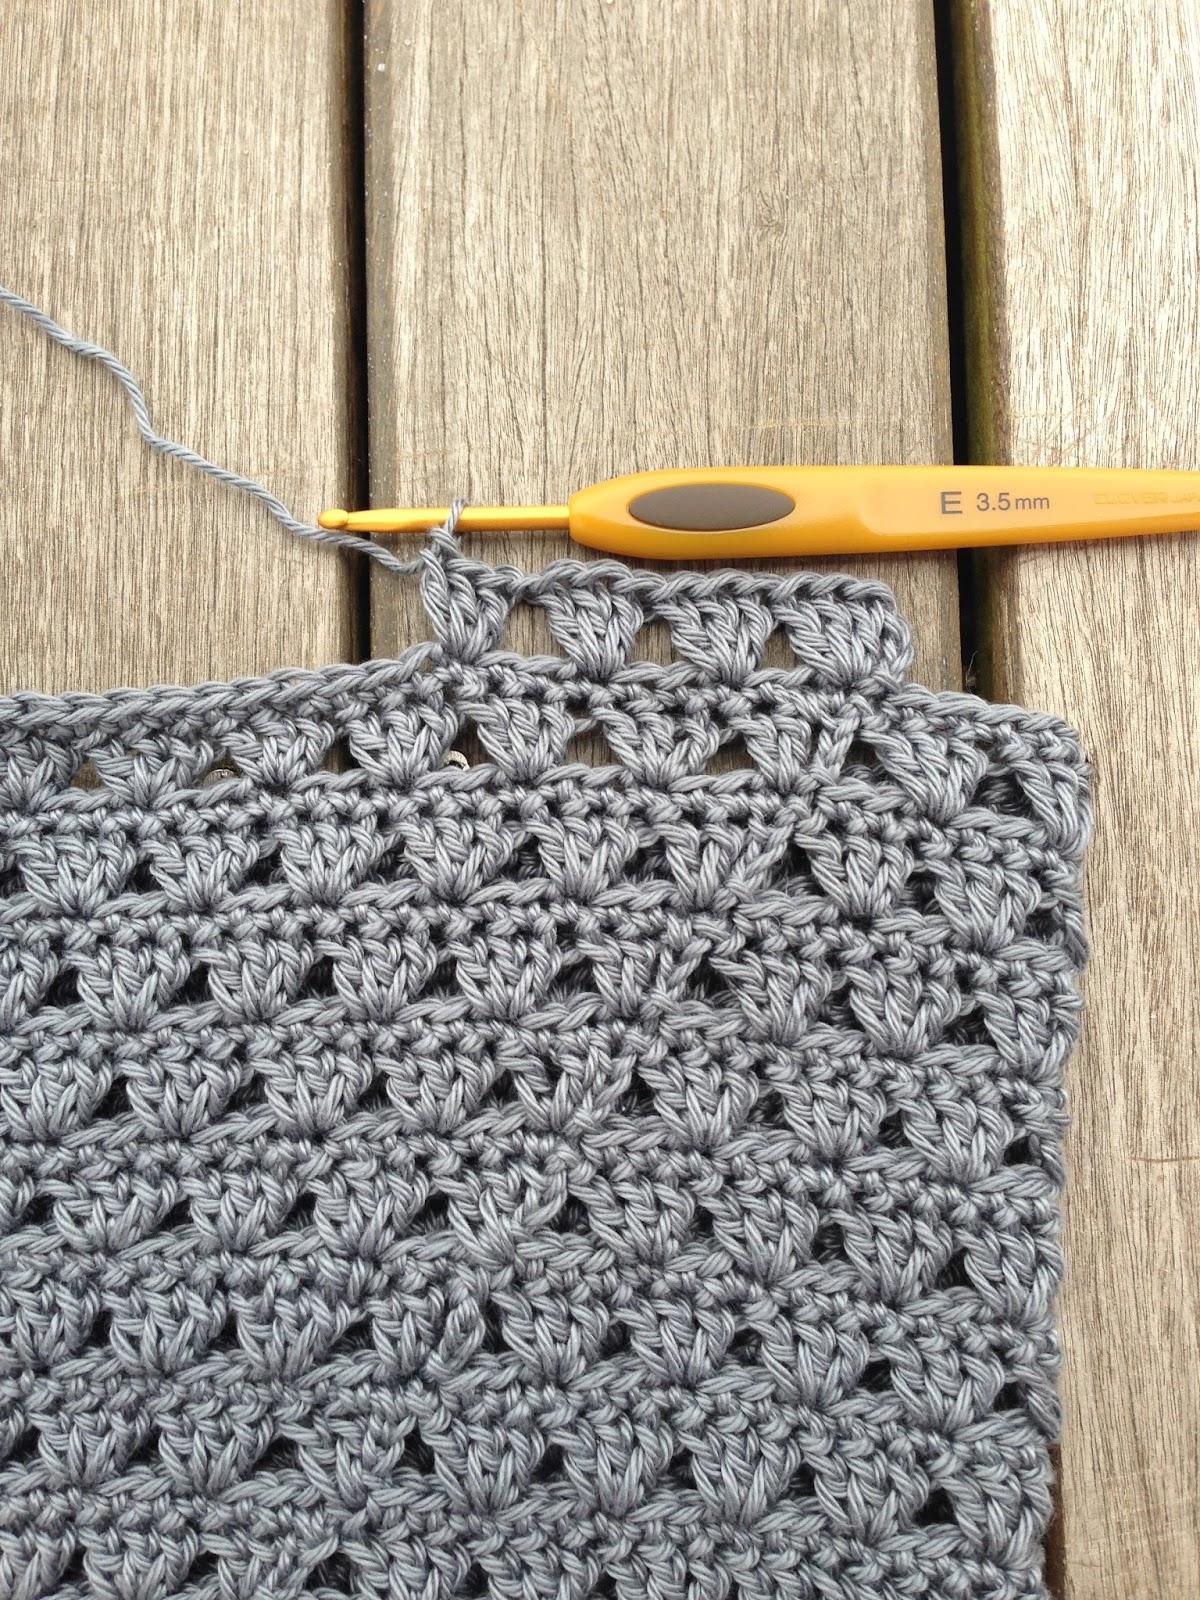 Crochet stuff - Cover